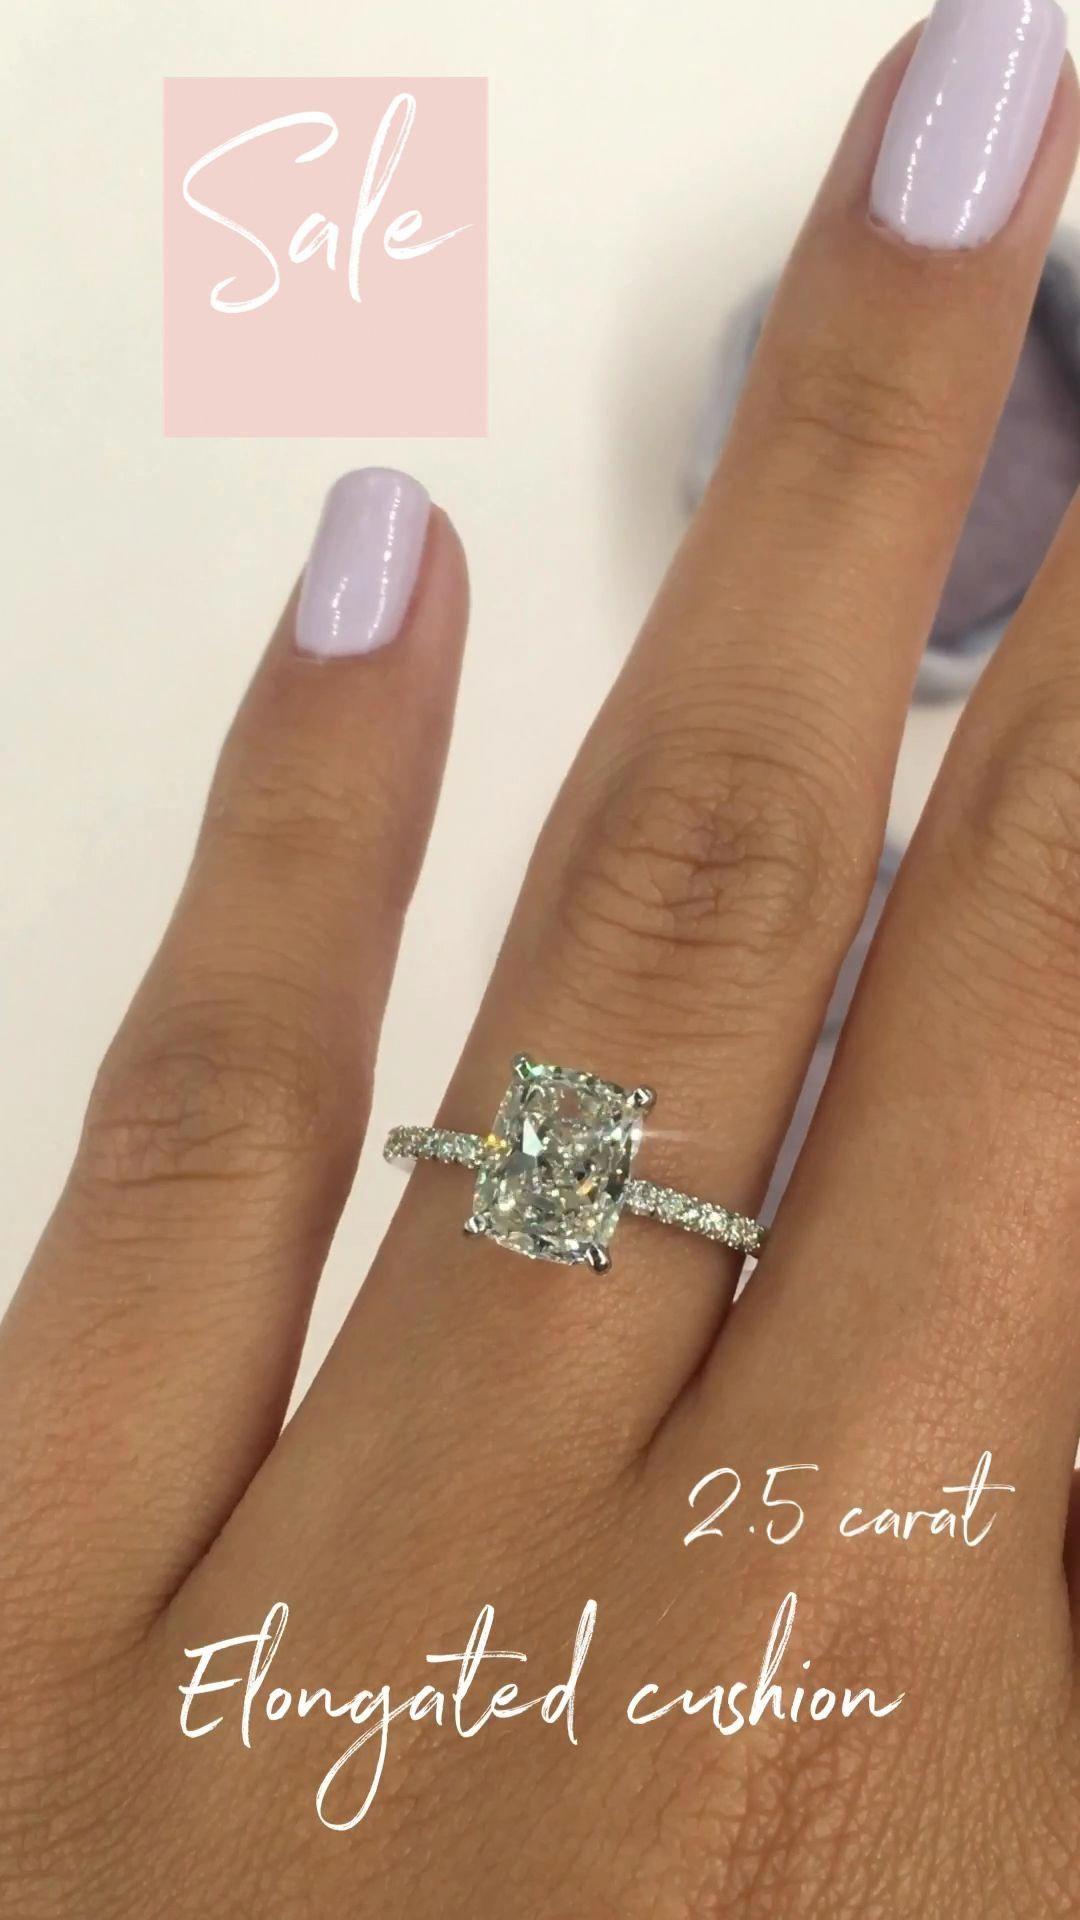 Diamond Engagement Ring, 2.20 Carat Elongated Cush